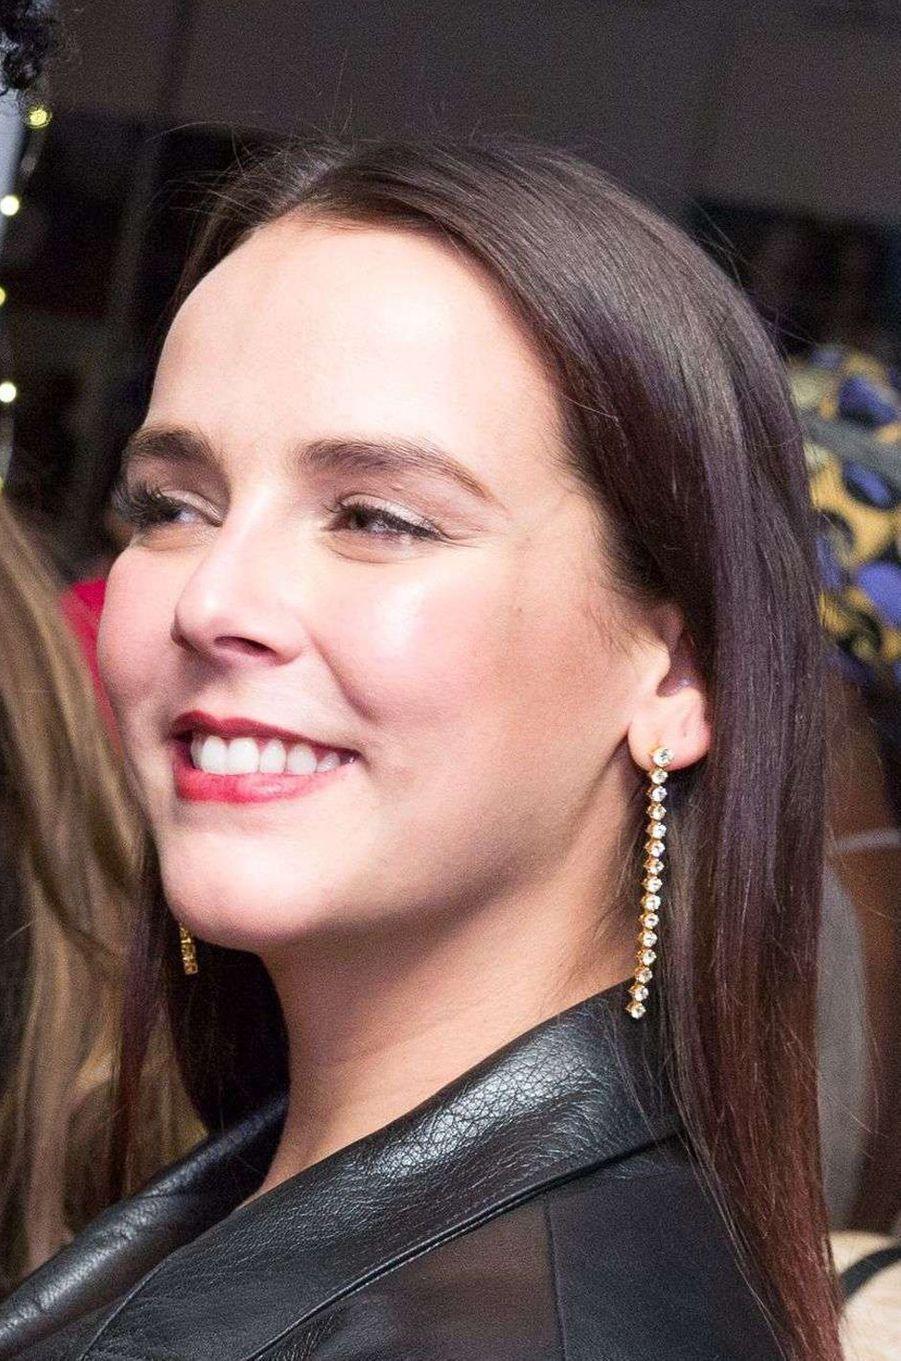 Pauline Ducruet à New York, le 15 novembre 2017